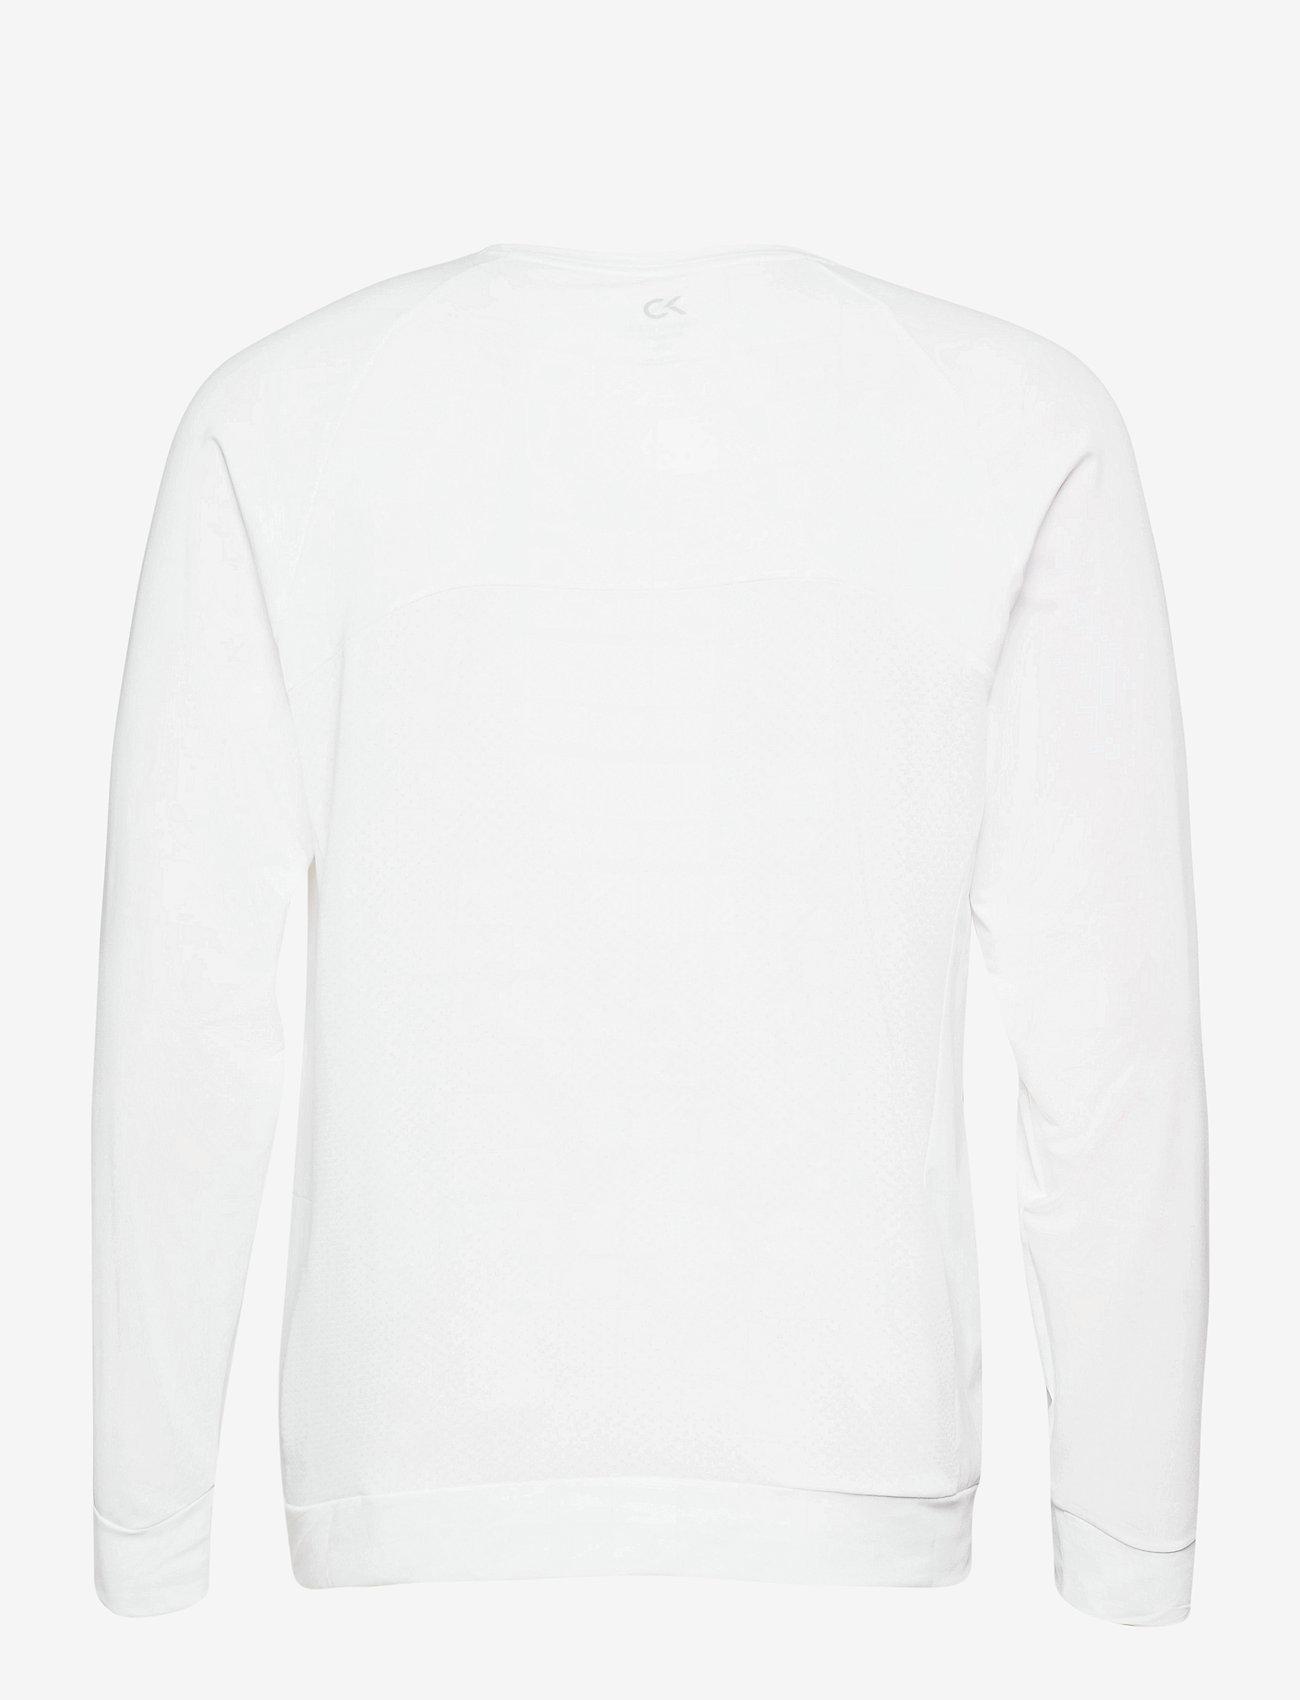 Calvin Klein Performance - WO - LONG SLEEVE T-SHIRT - hauts à manches longues - bright white - 1